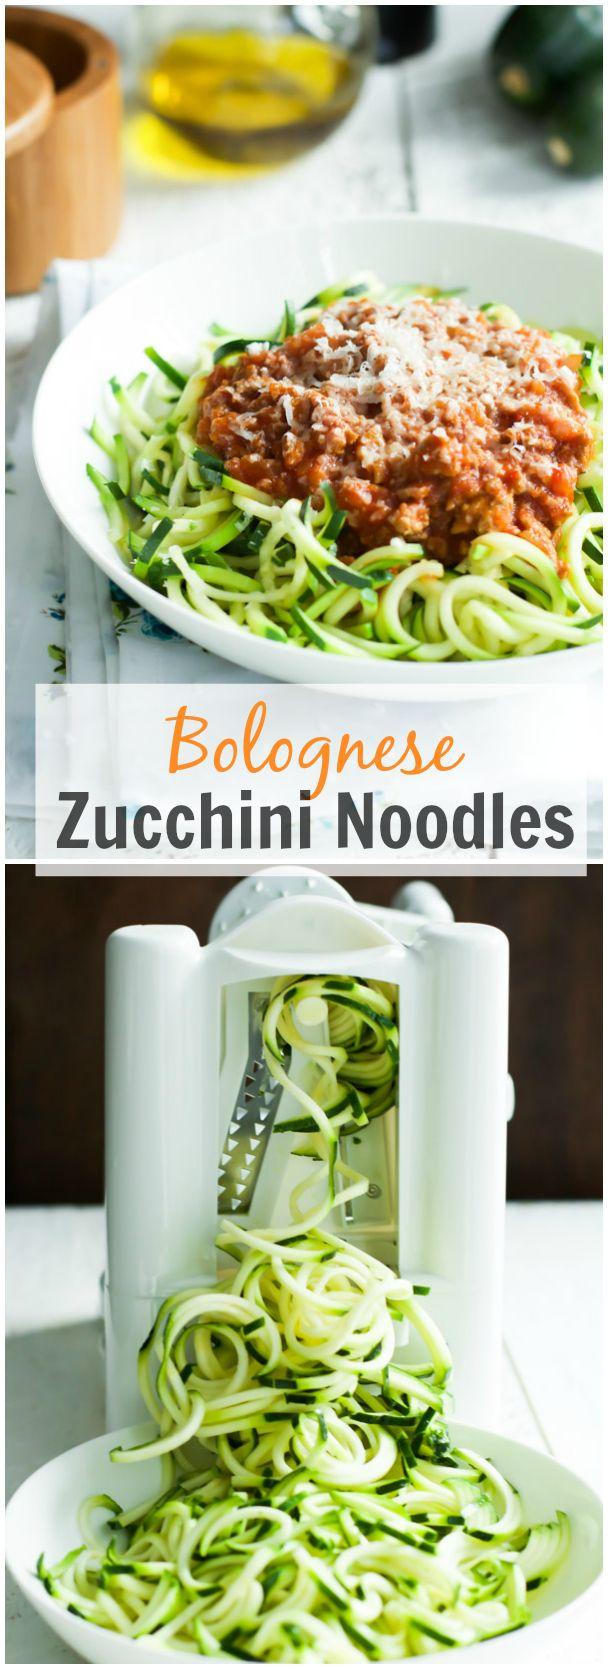 Bolognese Zucchini Noodles. primaverakitchen.com